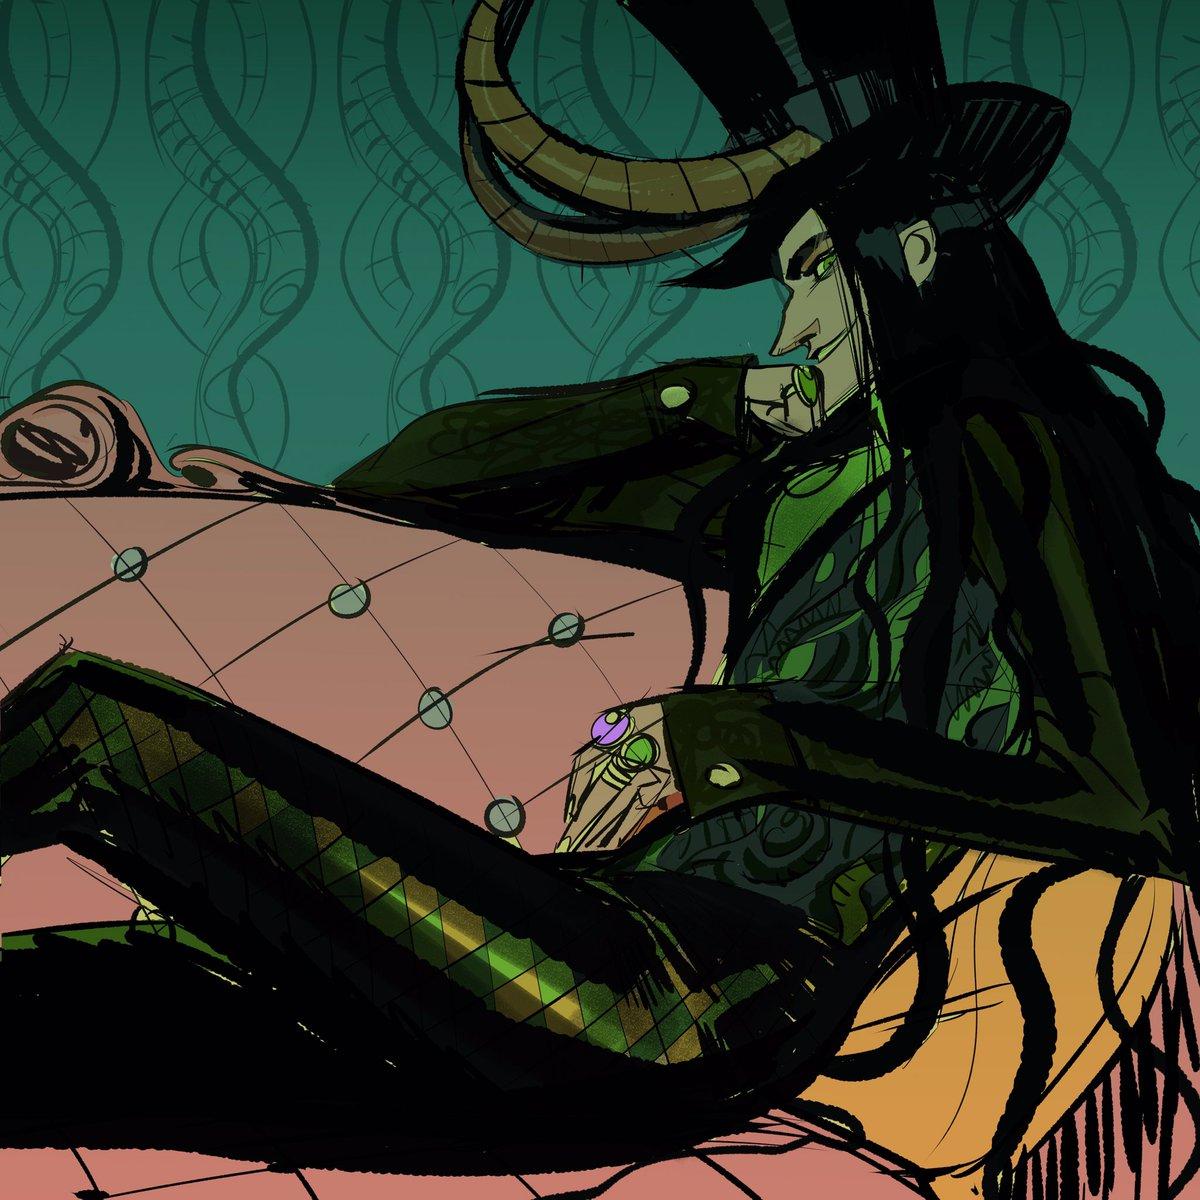 Victorian Loki. #loki #thor #marvelcomics #fanart #victorianfashion